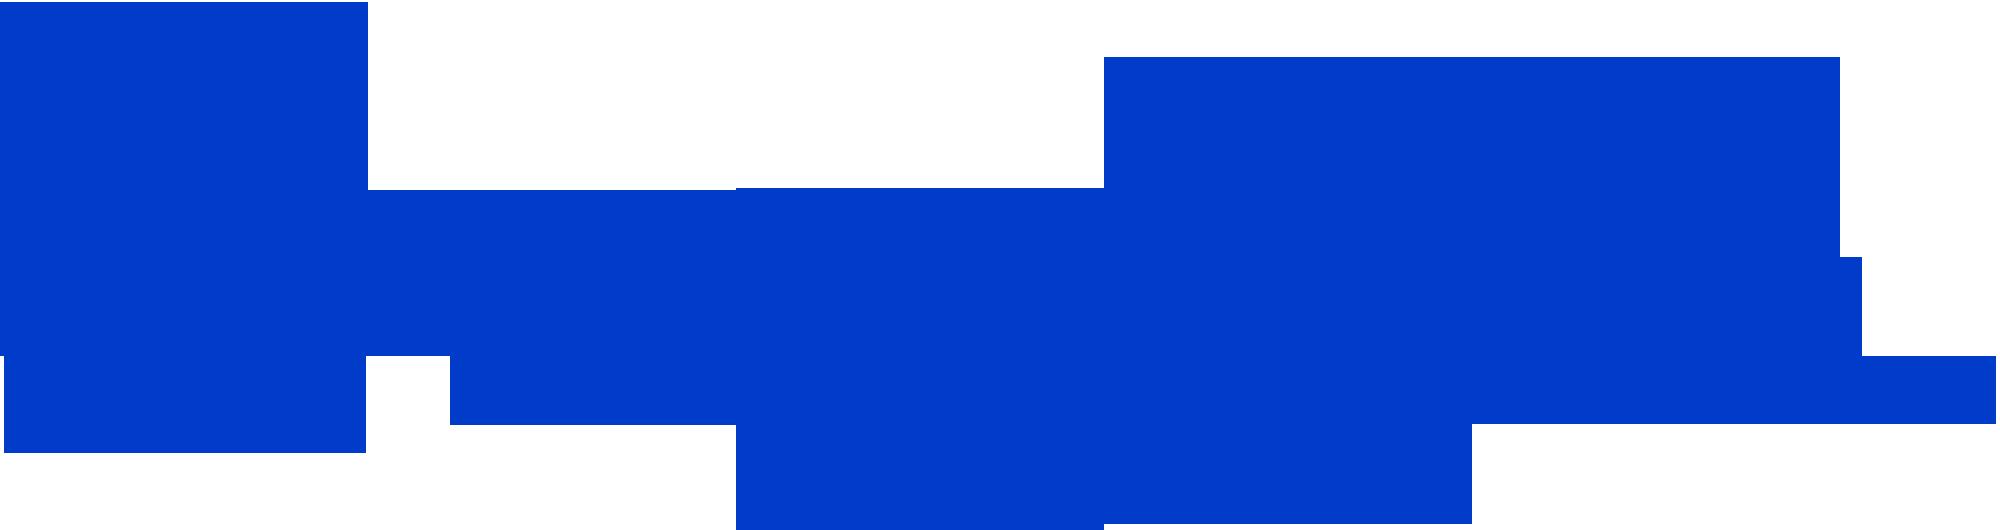 https://prestoninternational.com/wp-content/uploads/2018/06/0048353d-71c8-4958-827a-dc9952b0bdacSwagelok-logo.png